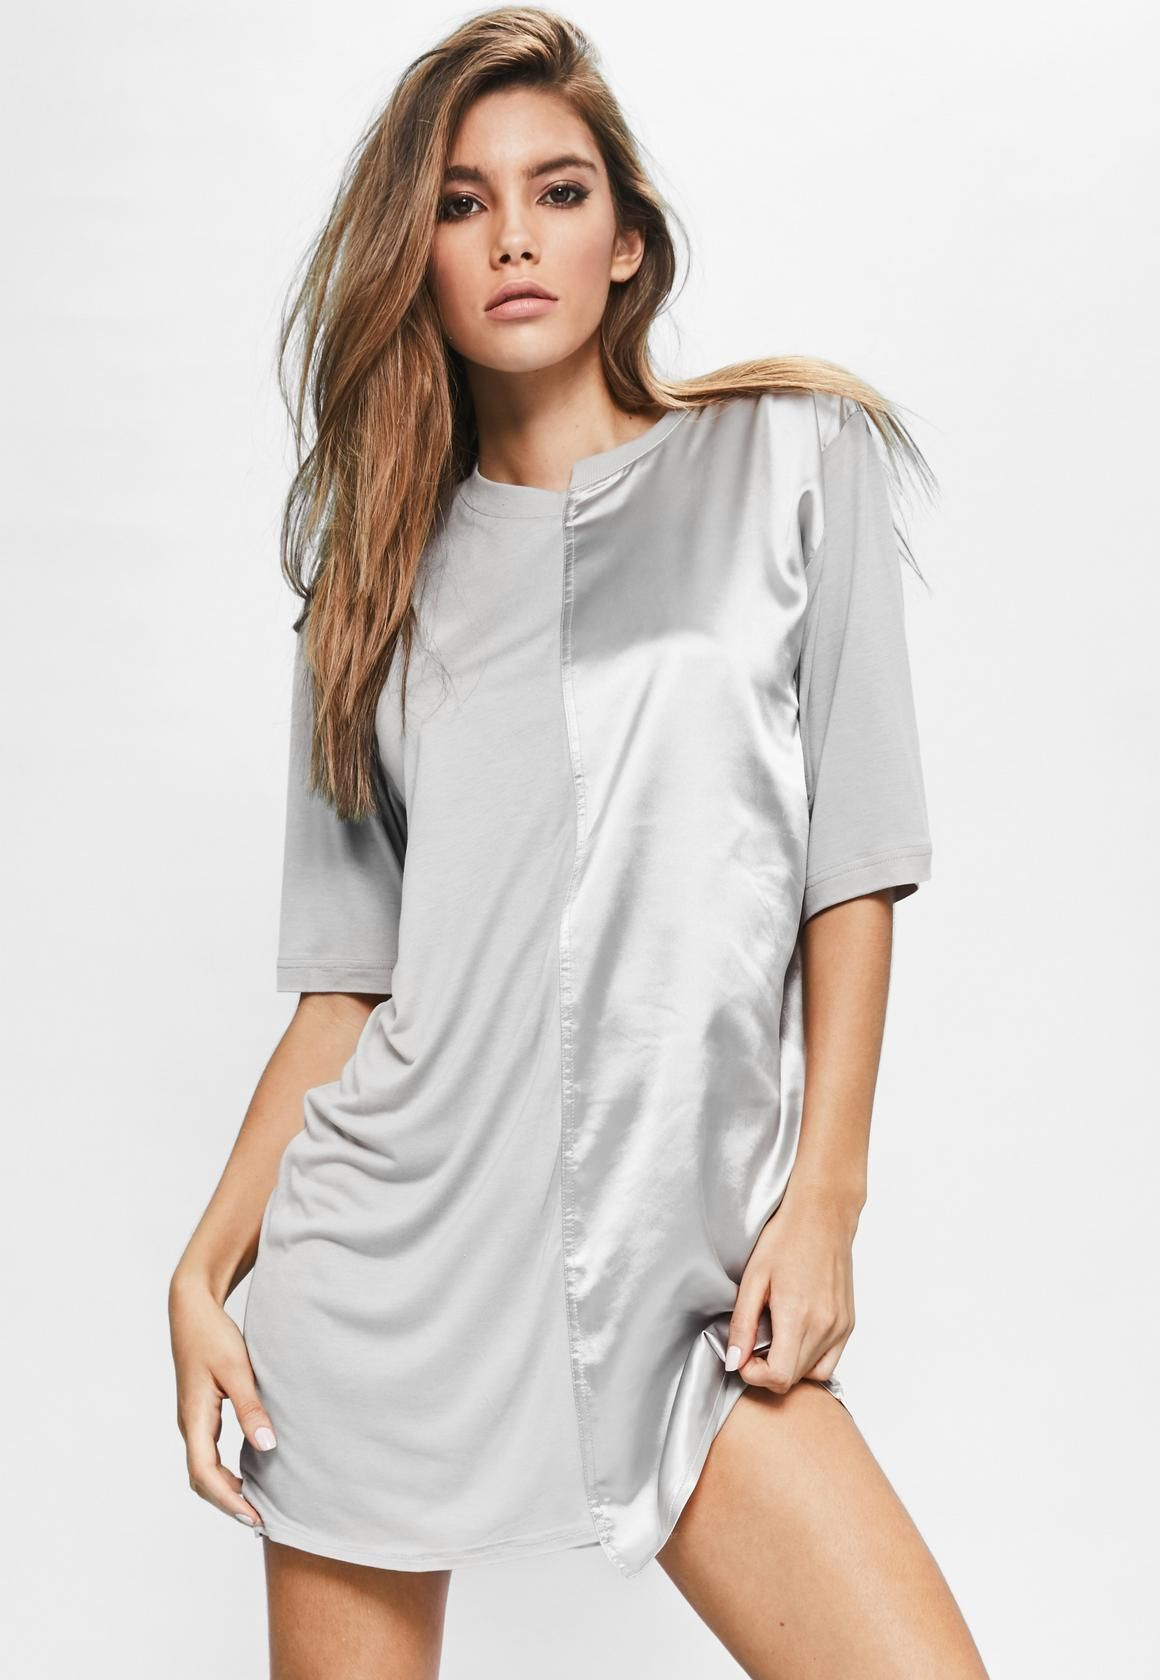 7366b255fc2 Londunn + Missguided Grey Spliced Satin Jersey T-shirt Dress - Missguided